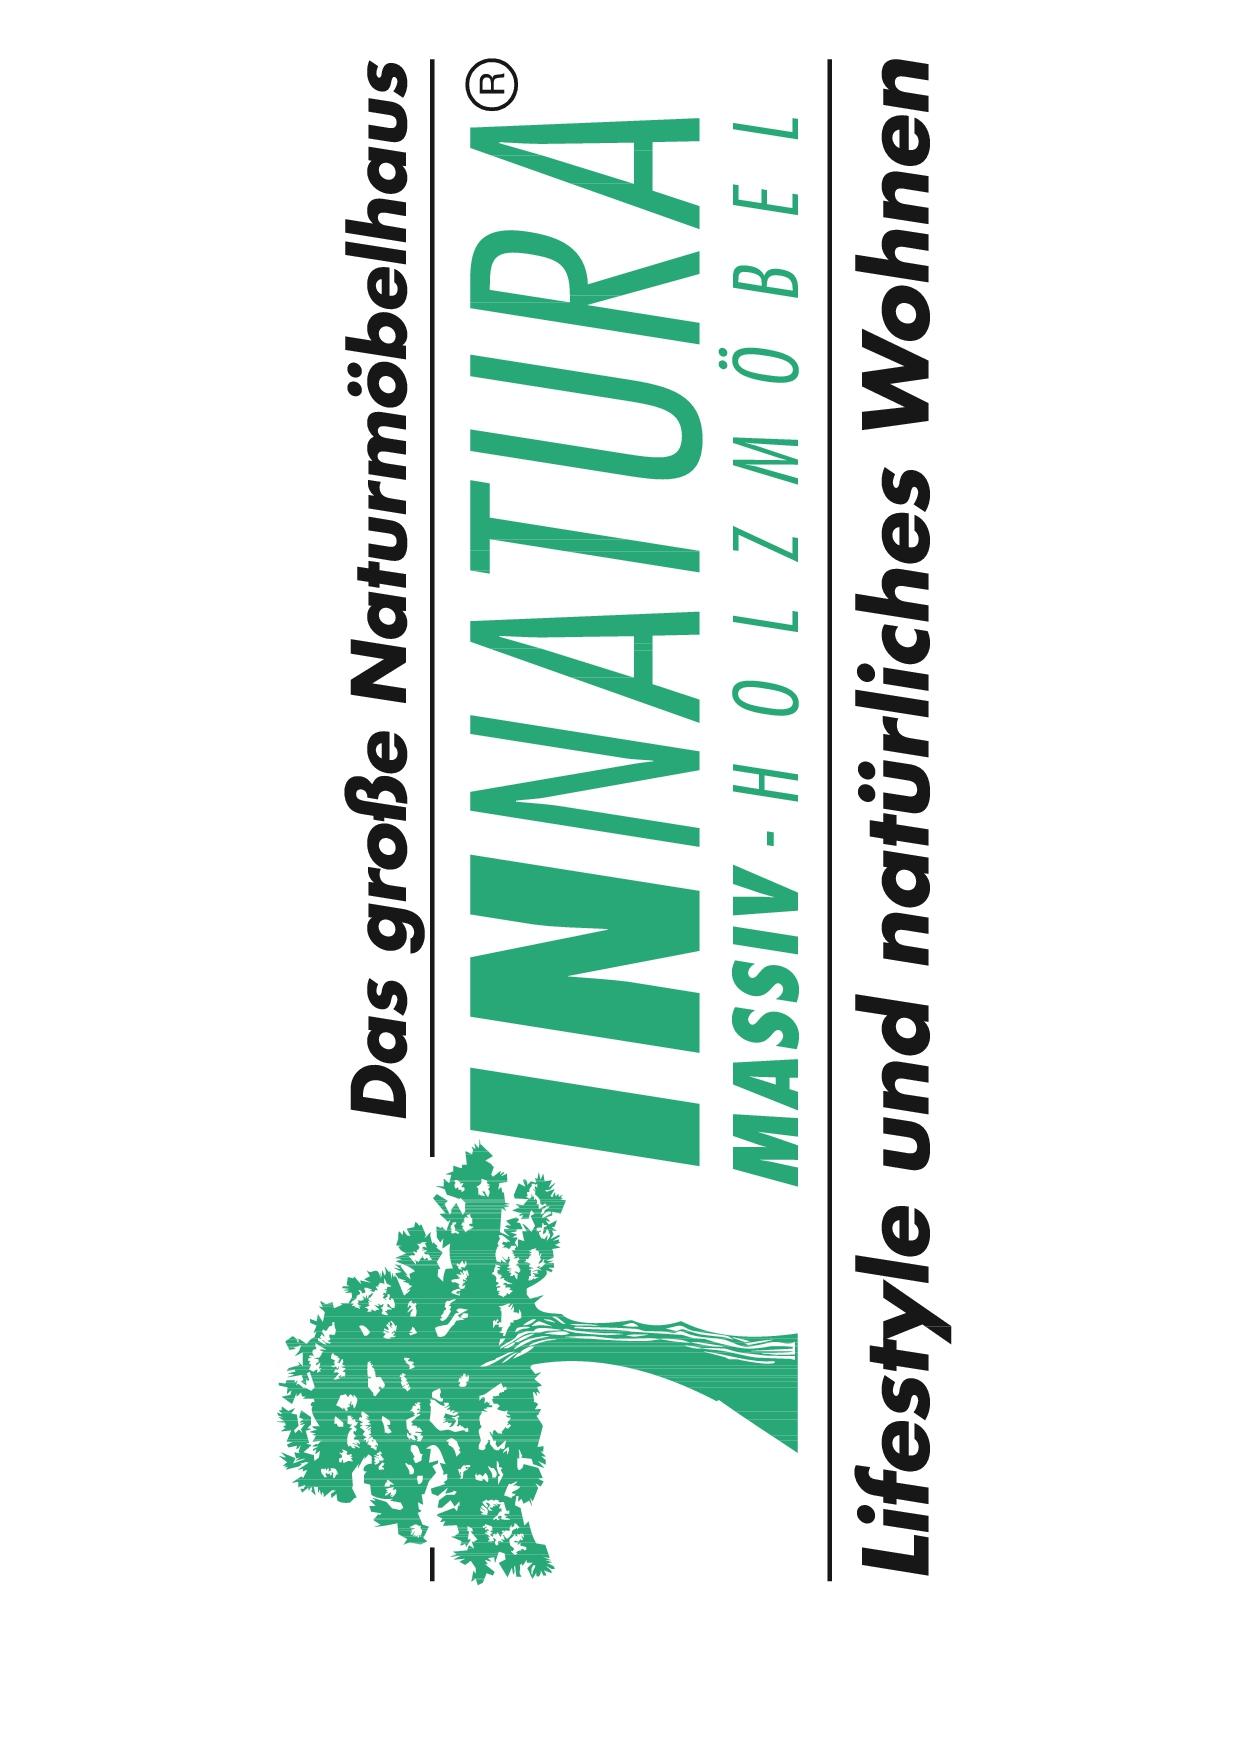 innatura-massiv-holzmoebel-gmbh-leinfelden-echterdingen logo